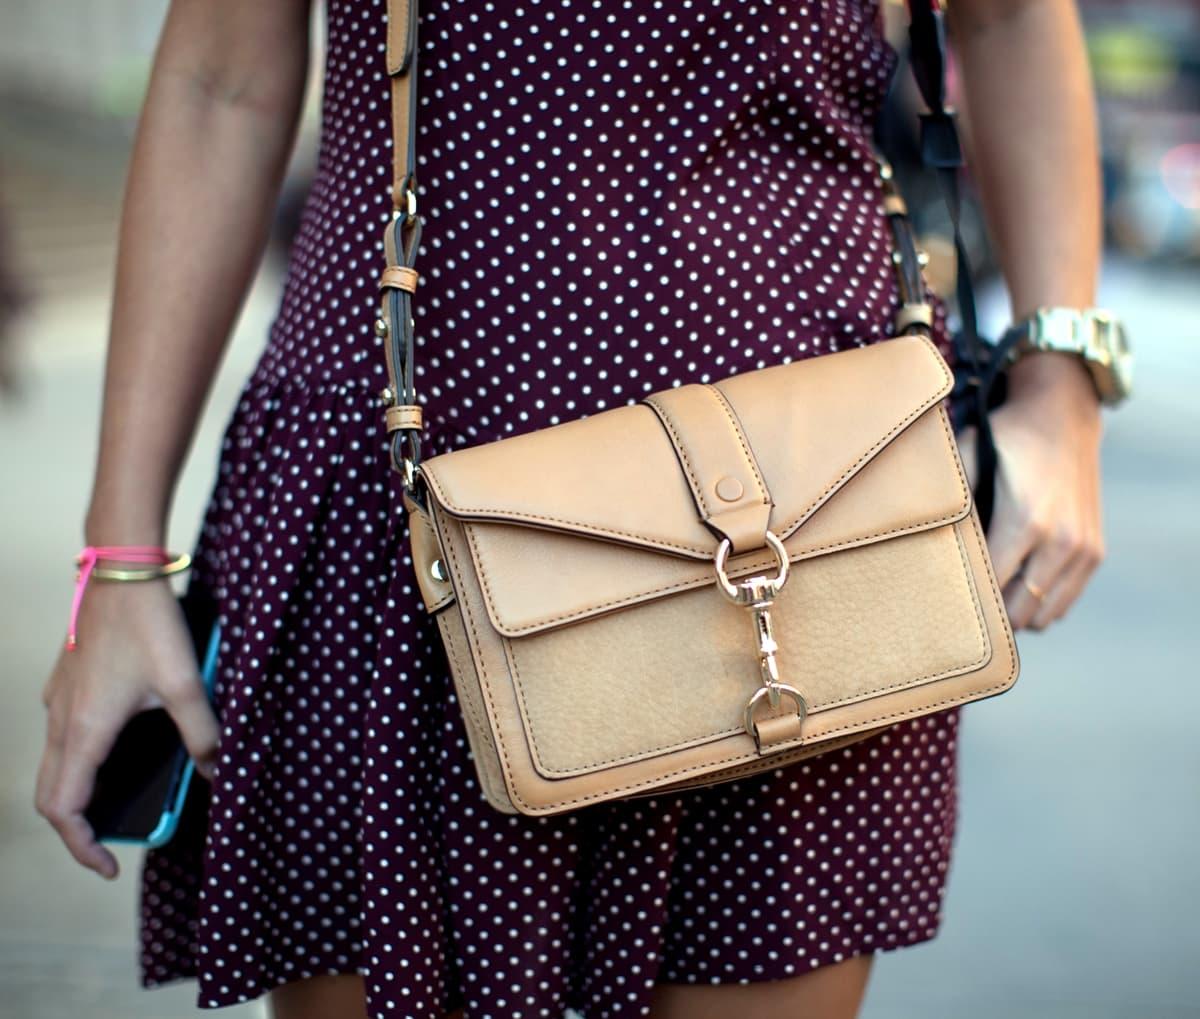 Sara Escudero shows off her authentic Rebecca Minkoff handbag during New York Women Fashion Week